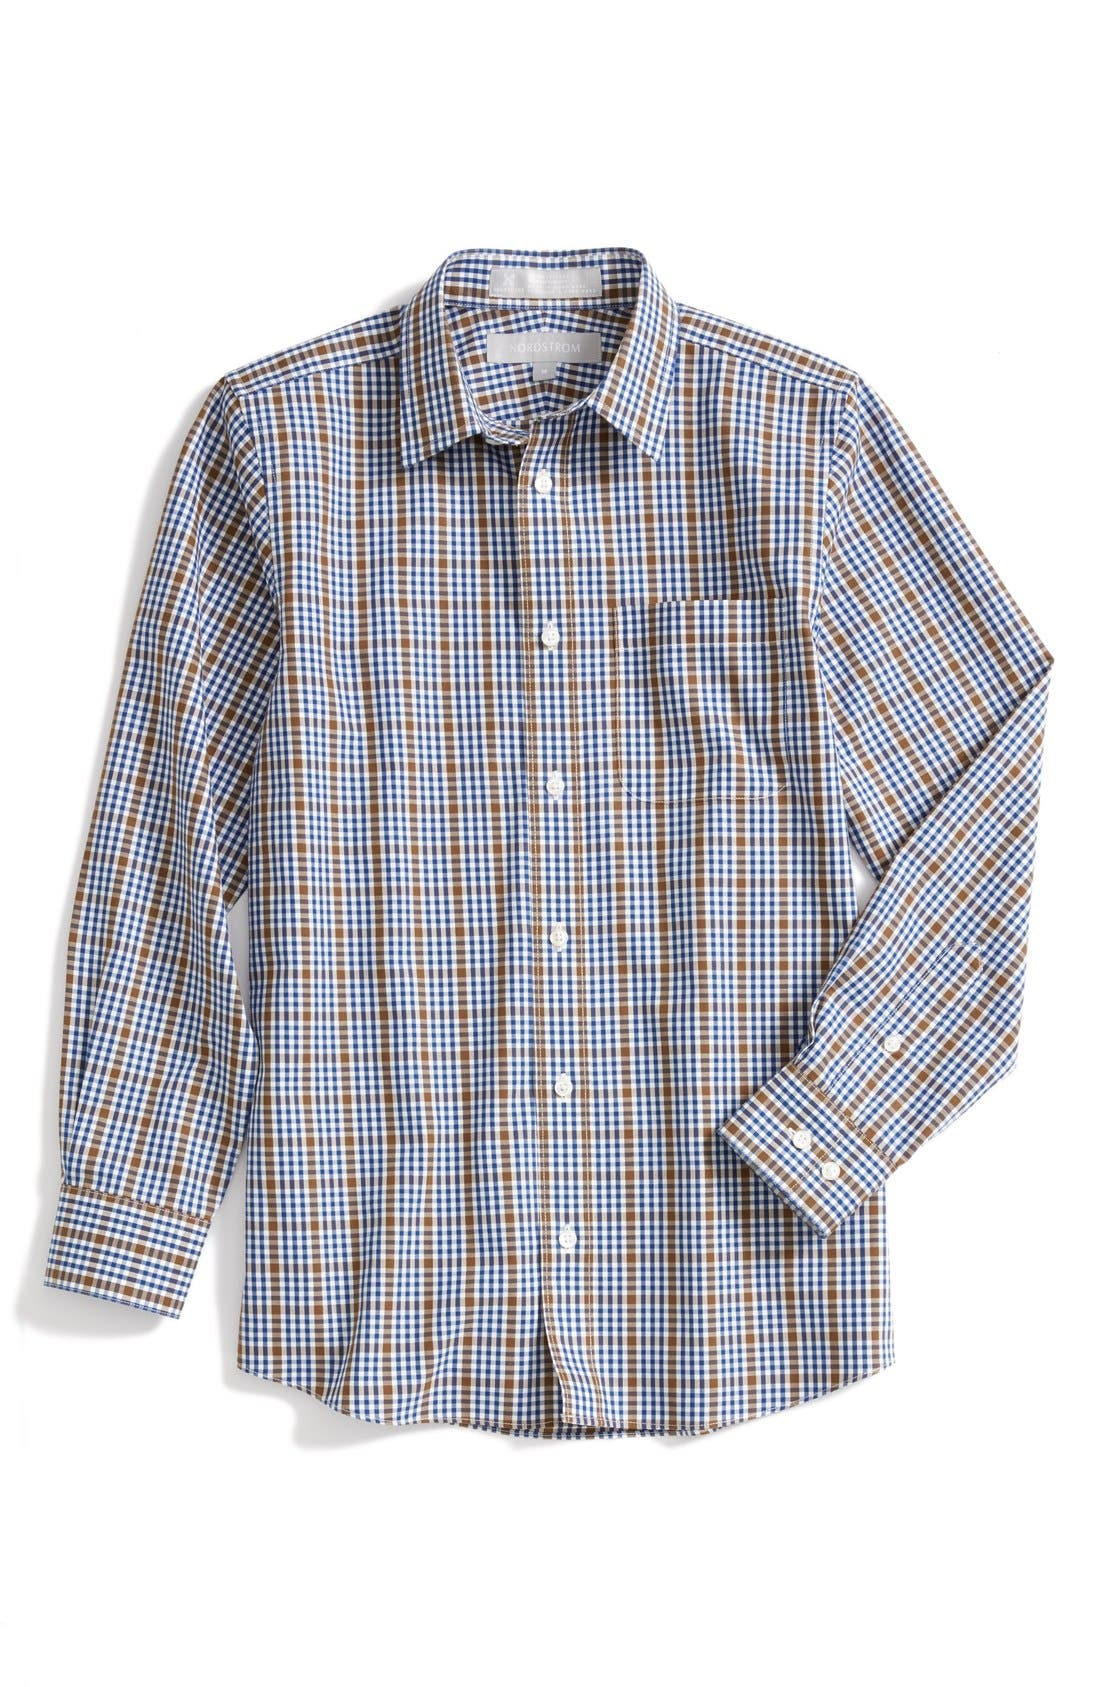 Main Image - Nordstrom Smartcare™ Dress Shirt (Little Boys & Big Boys)